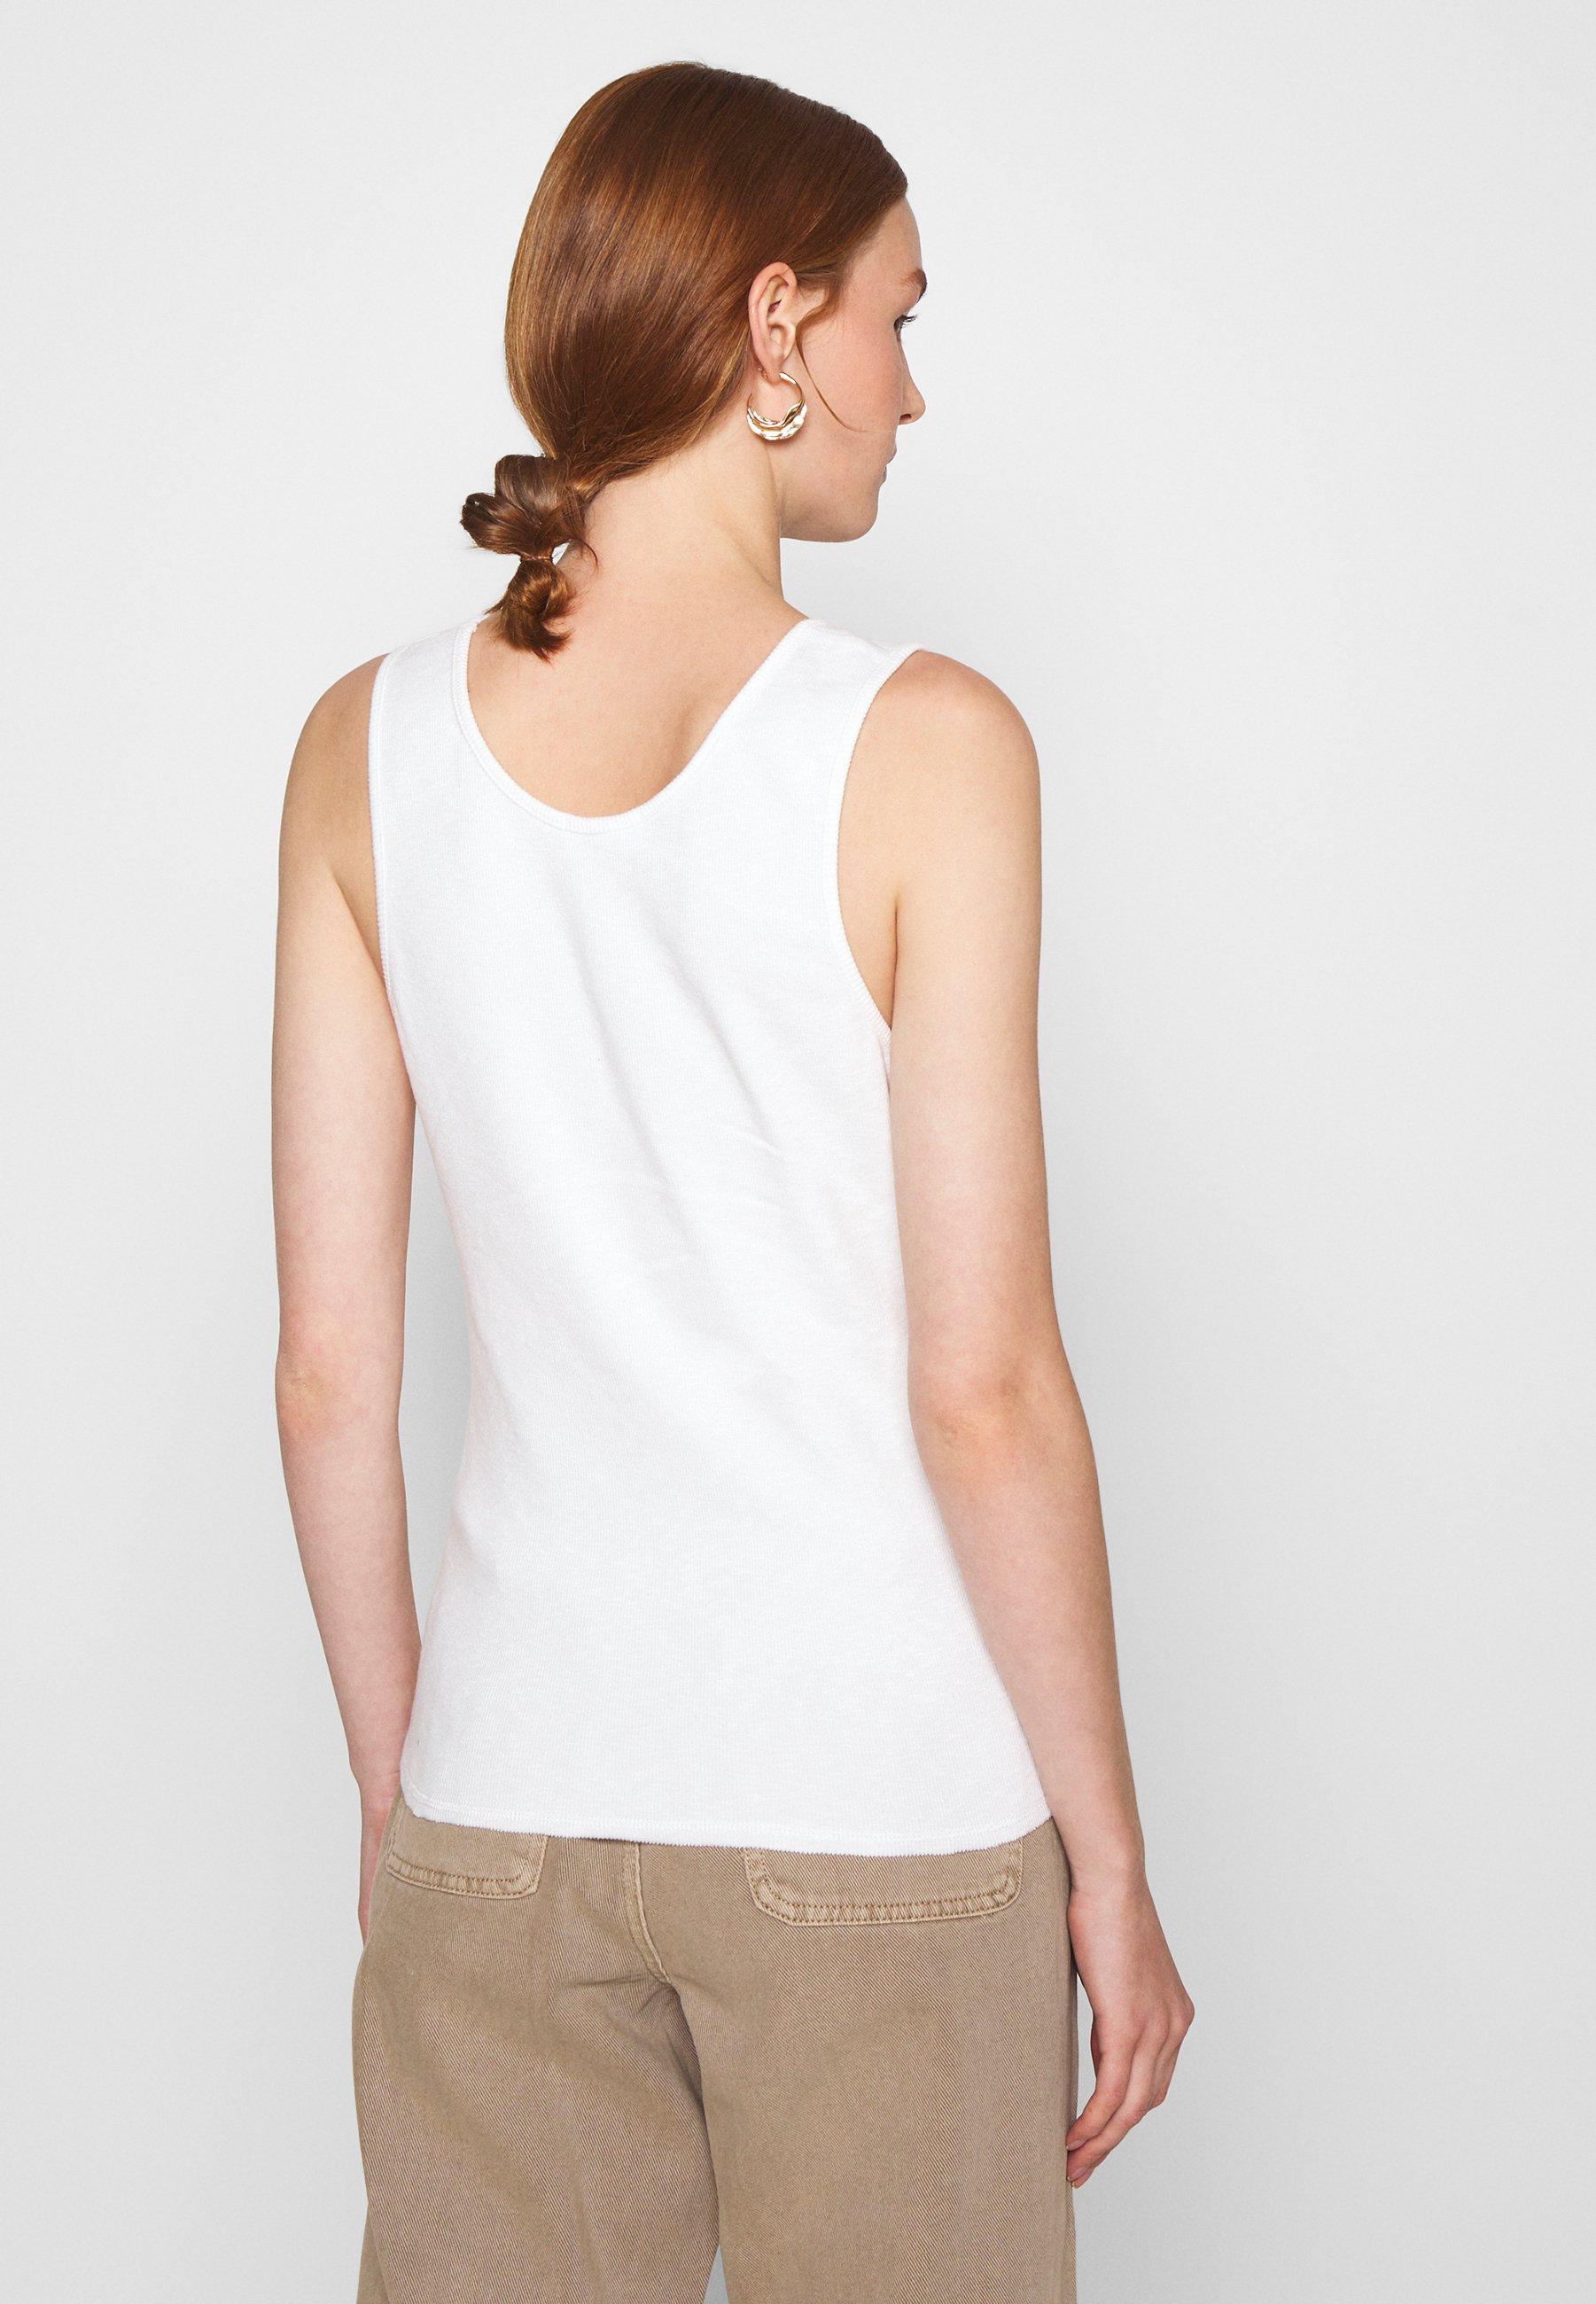 American Vintage SONICAKE - Débardeur - blanc - Tops & T-shirts Femme ySt2K